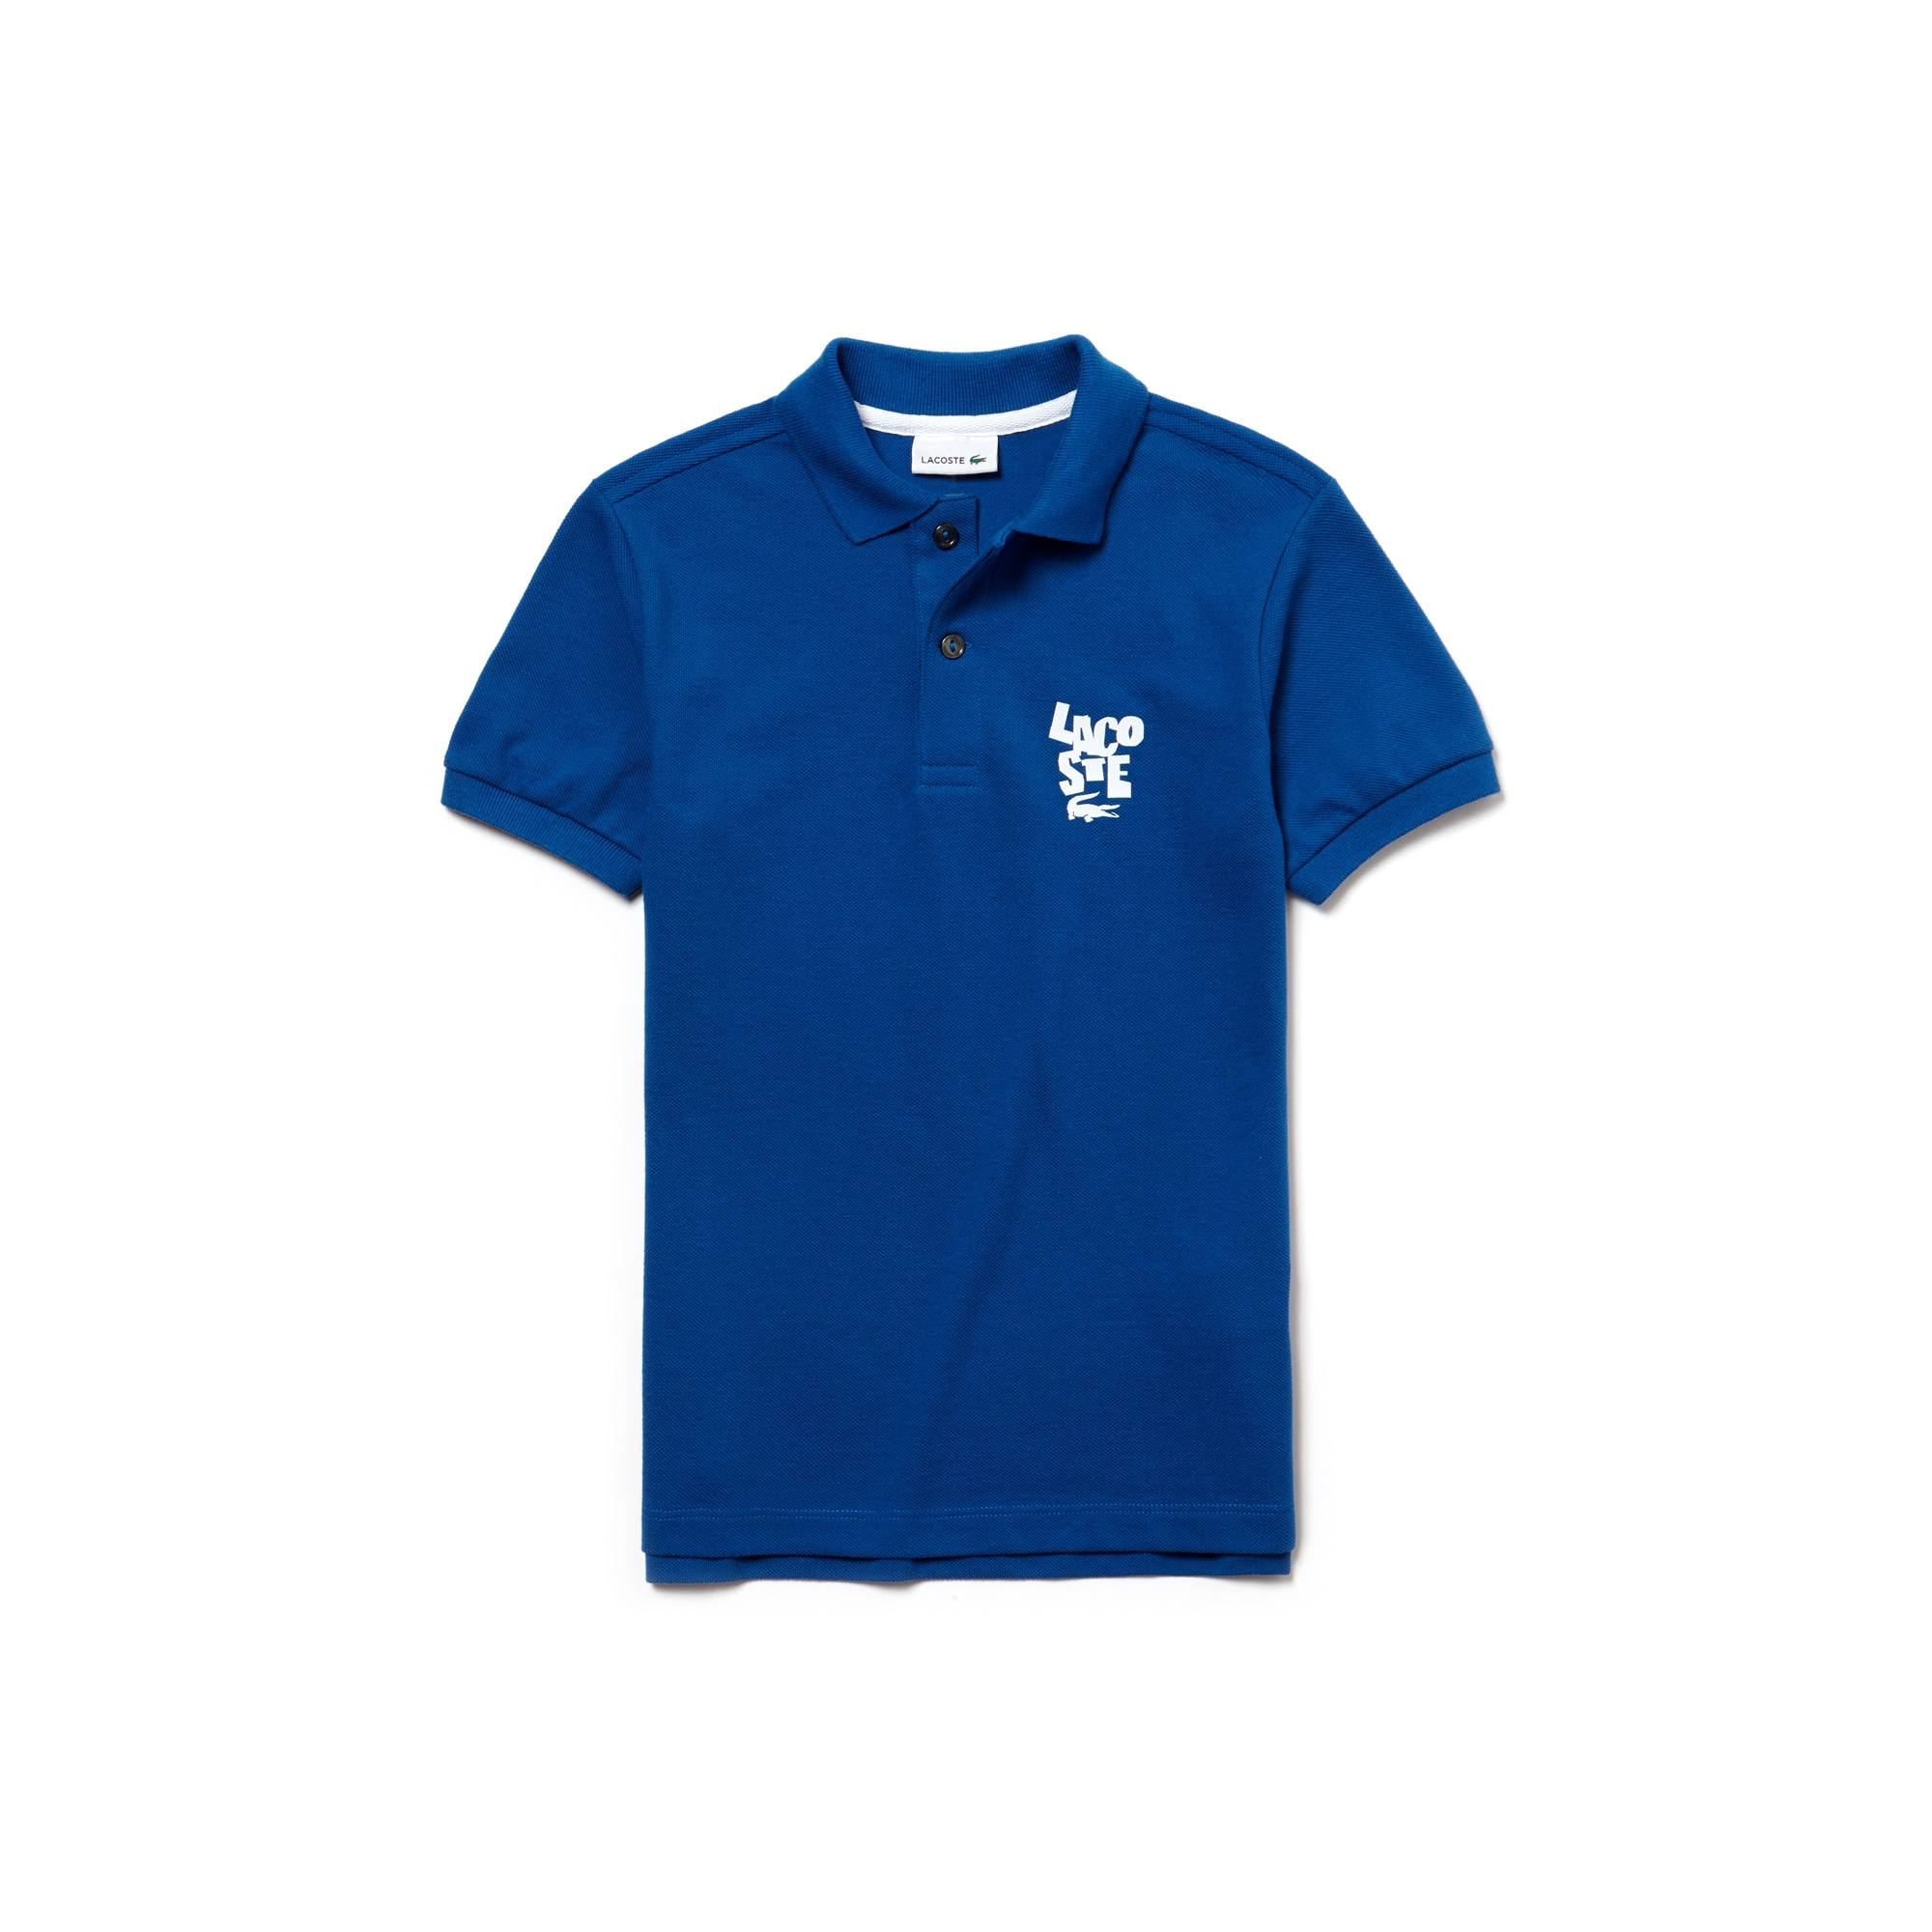 1785b6fd027 Camisa Polo Masculina Infantil em Petit Piqué com Palavra Lacoste ...